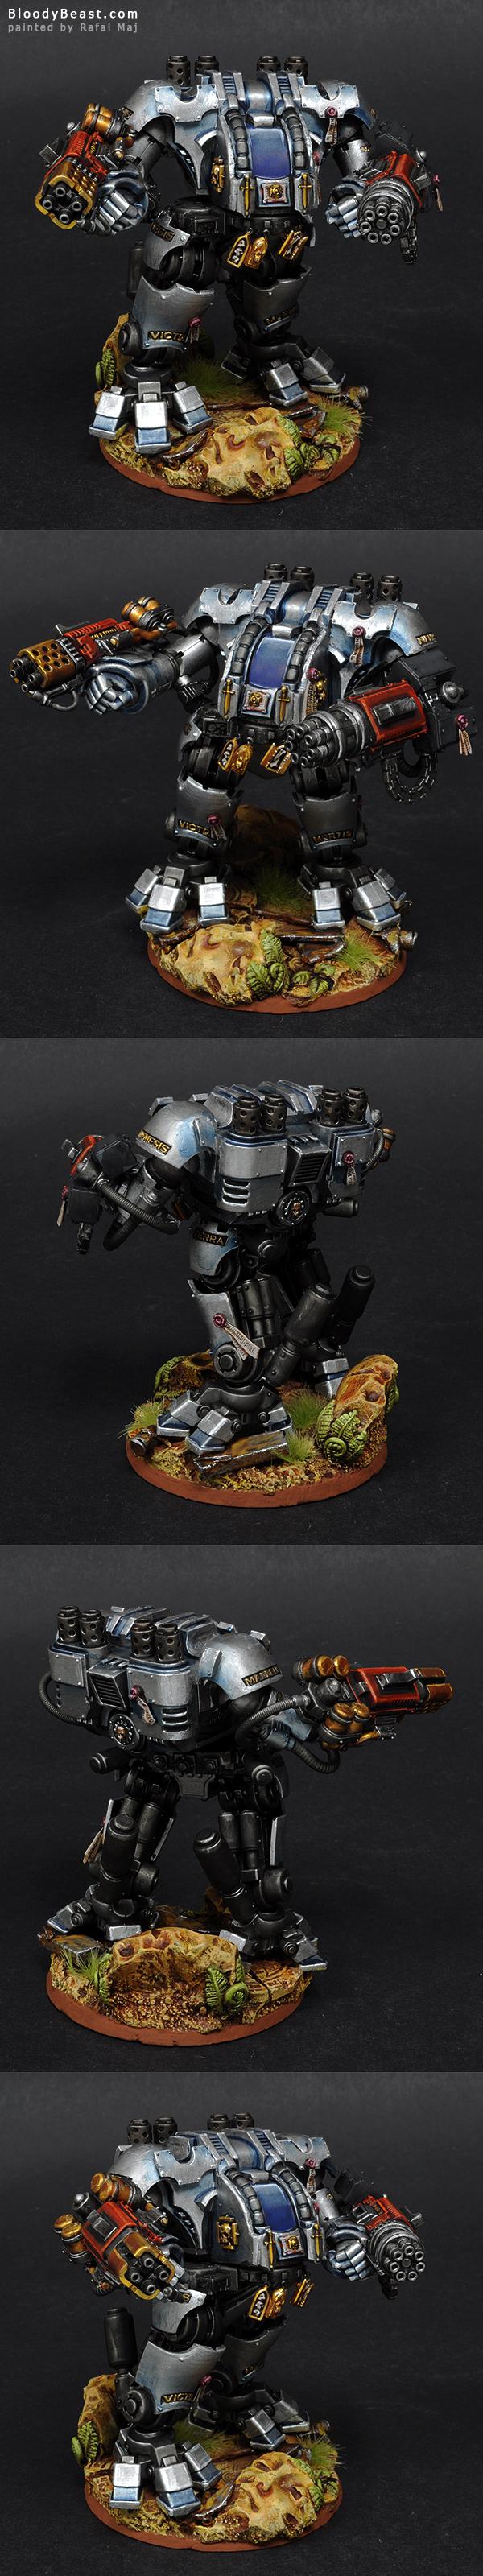 Grey Knights Dreadnought painted by Rafal Maj (BloodyBeast.com)